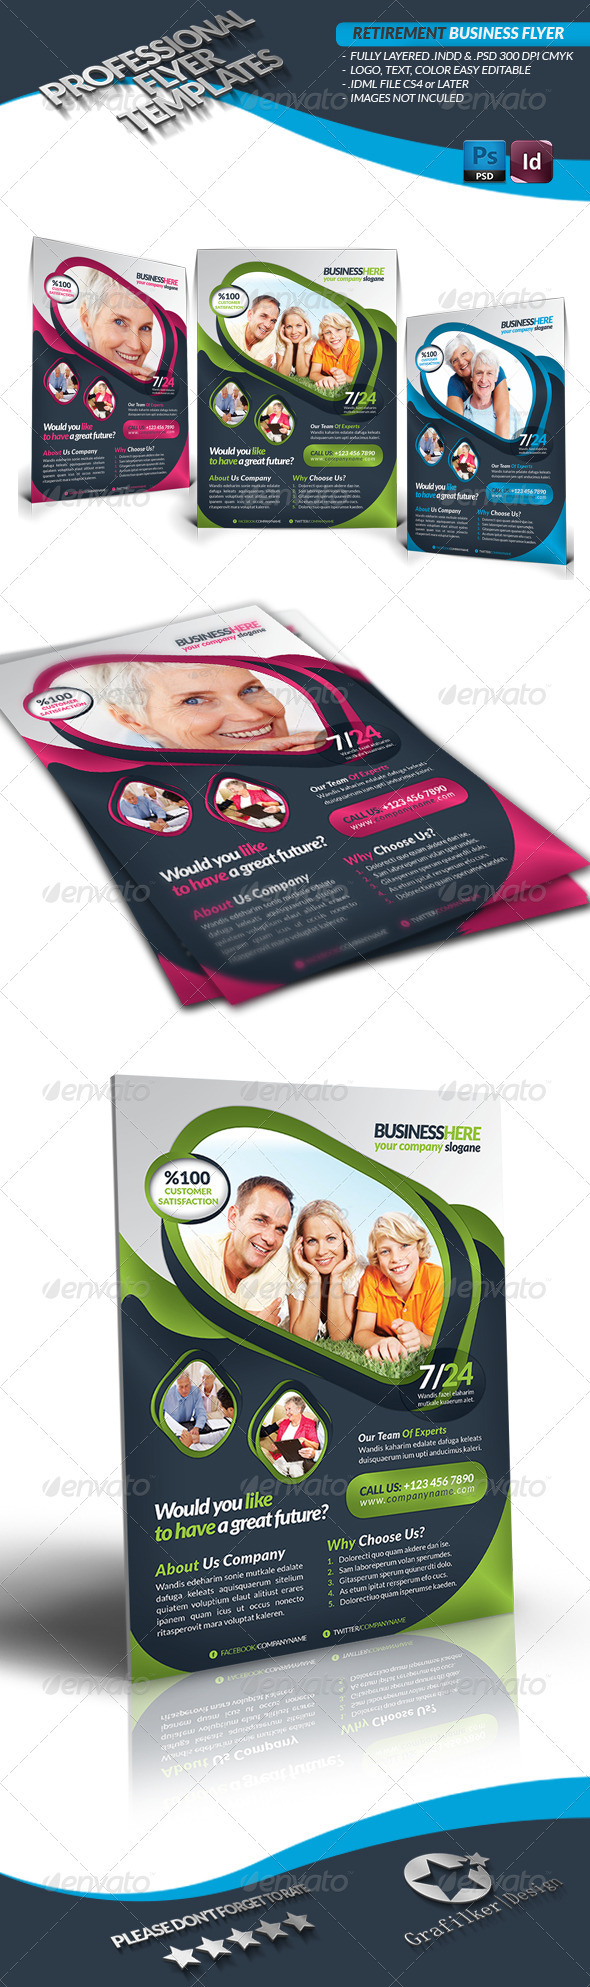 Retirement Business Flyer - Flyers Print Templates